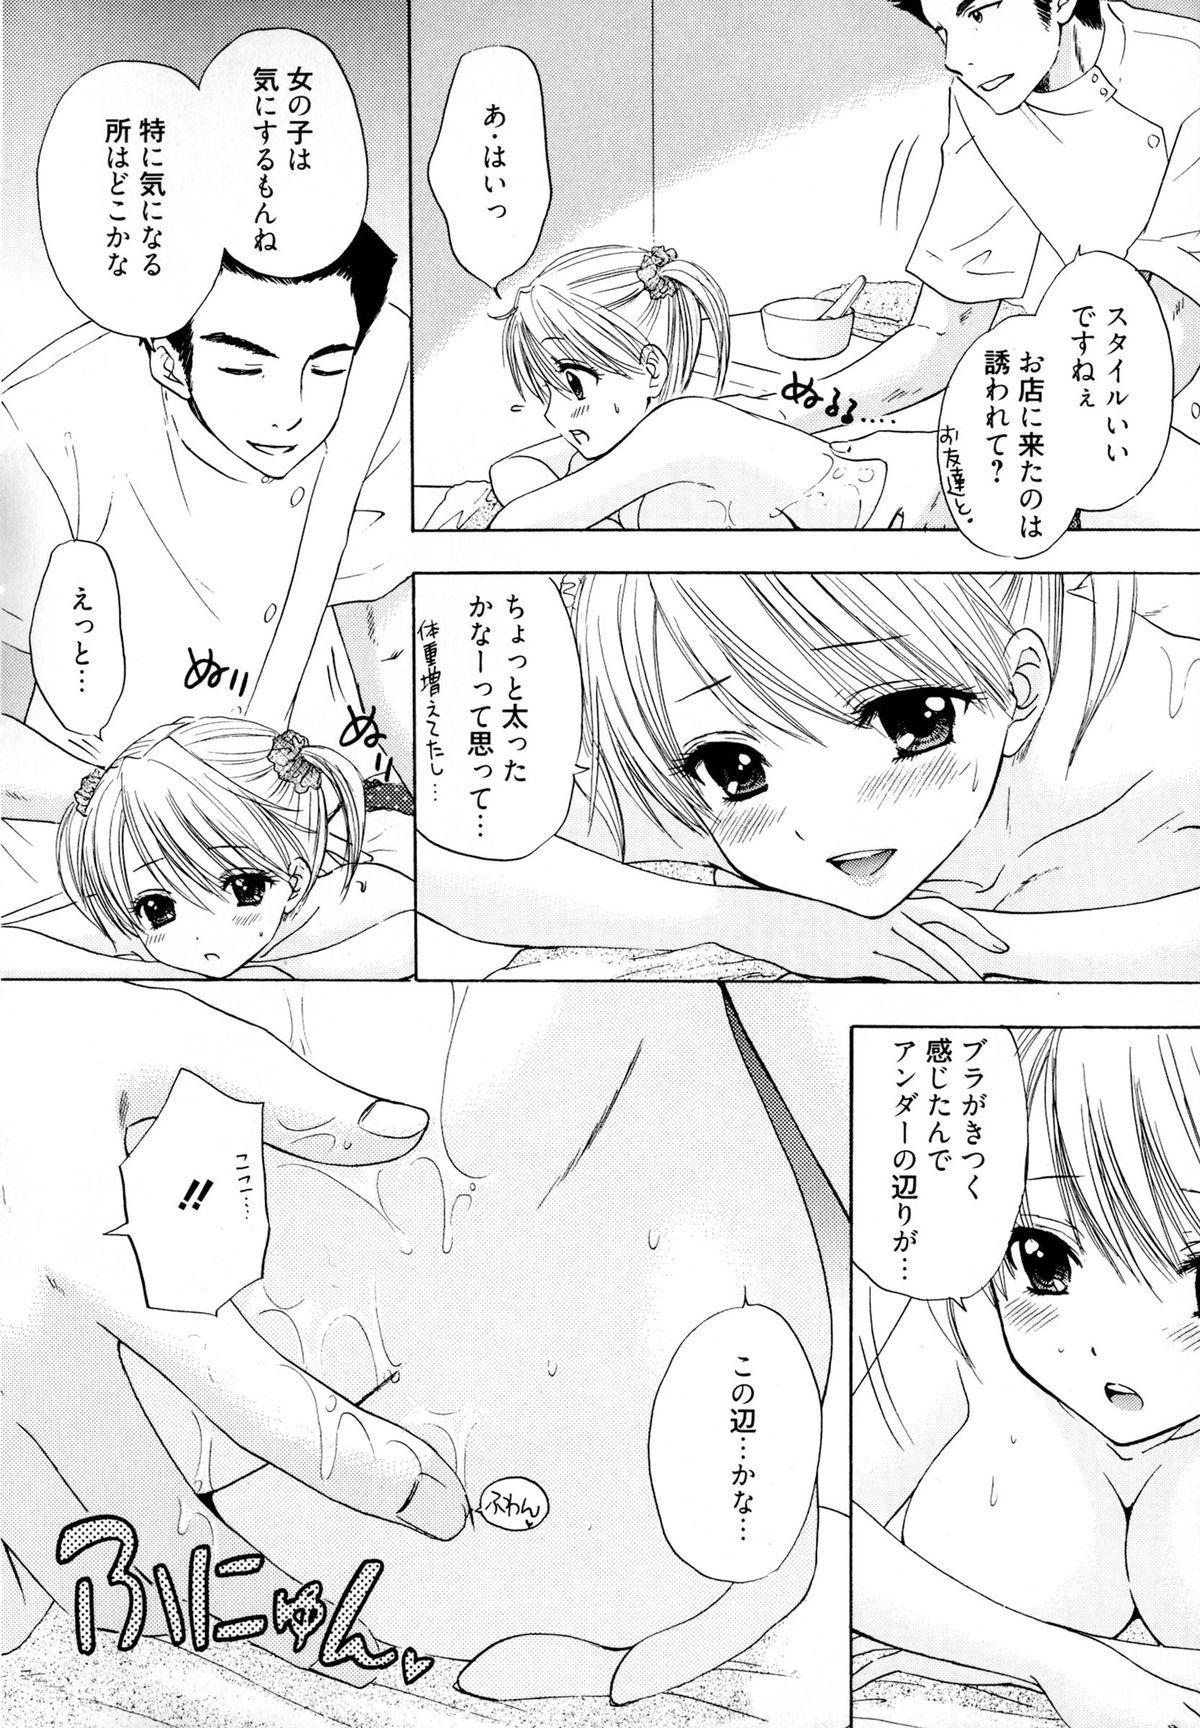 The Great Escape 4 Shokai Genteiban 41